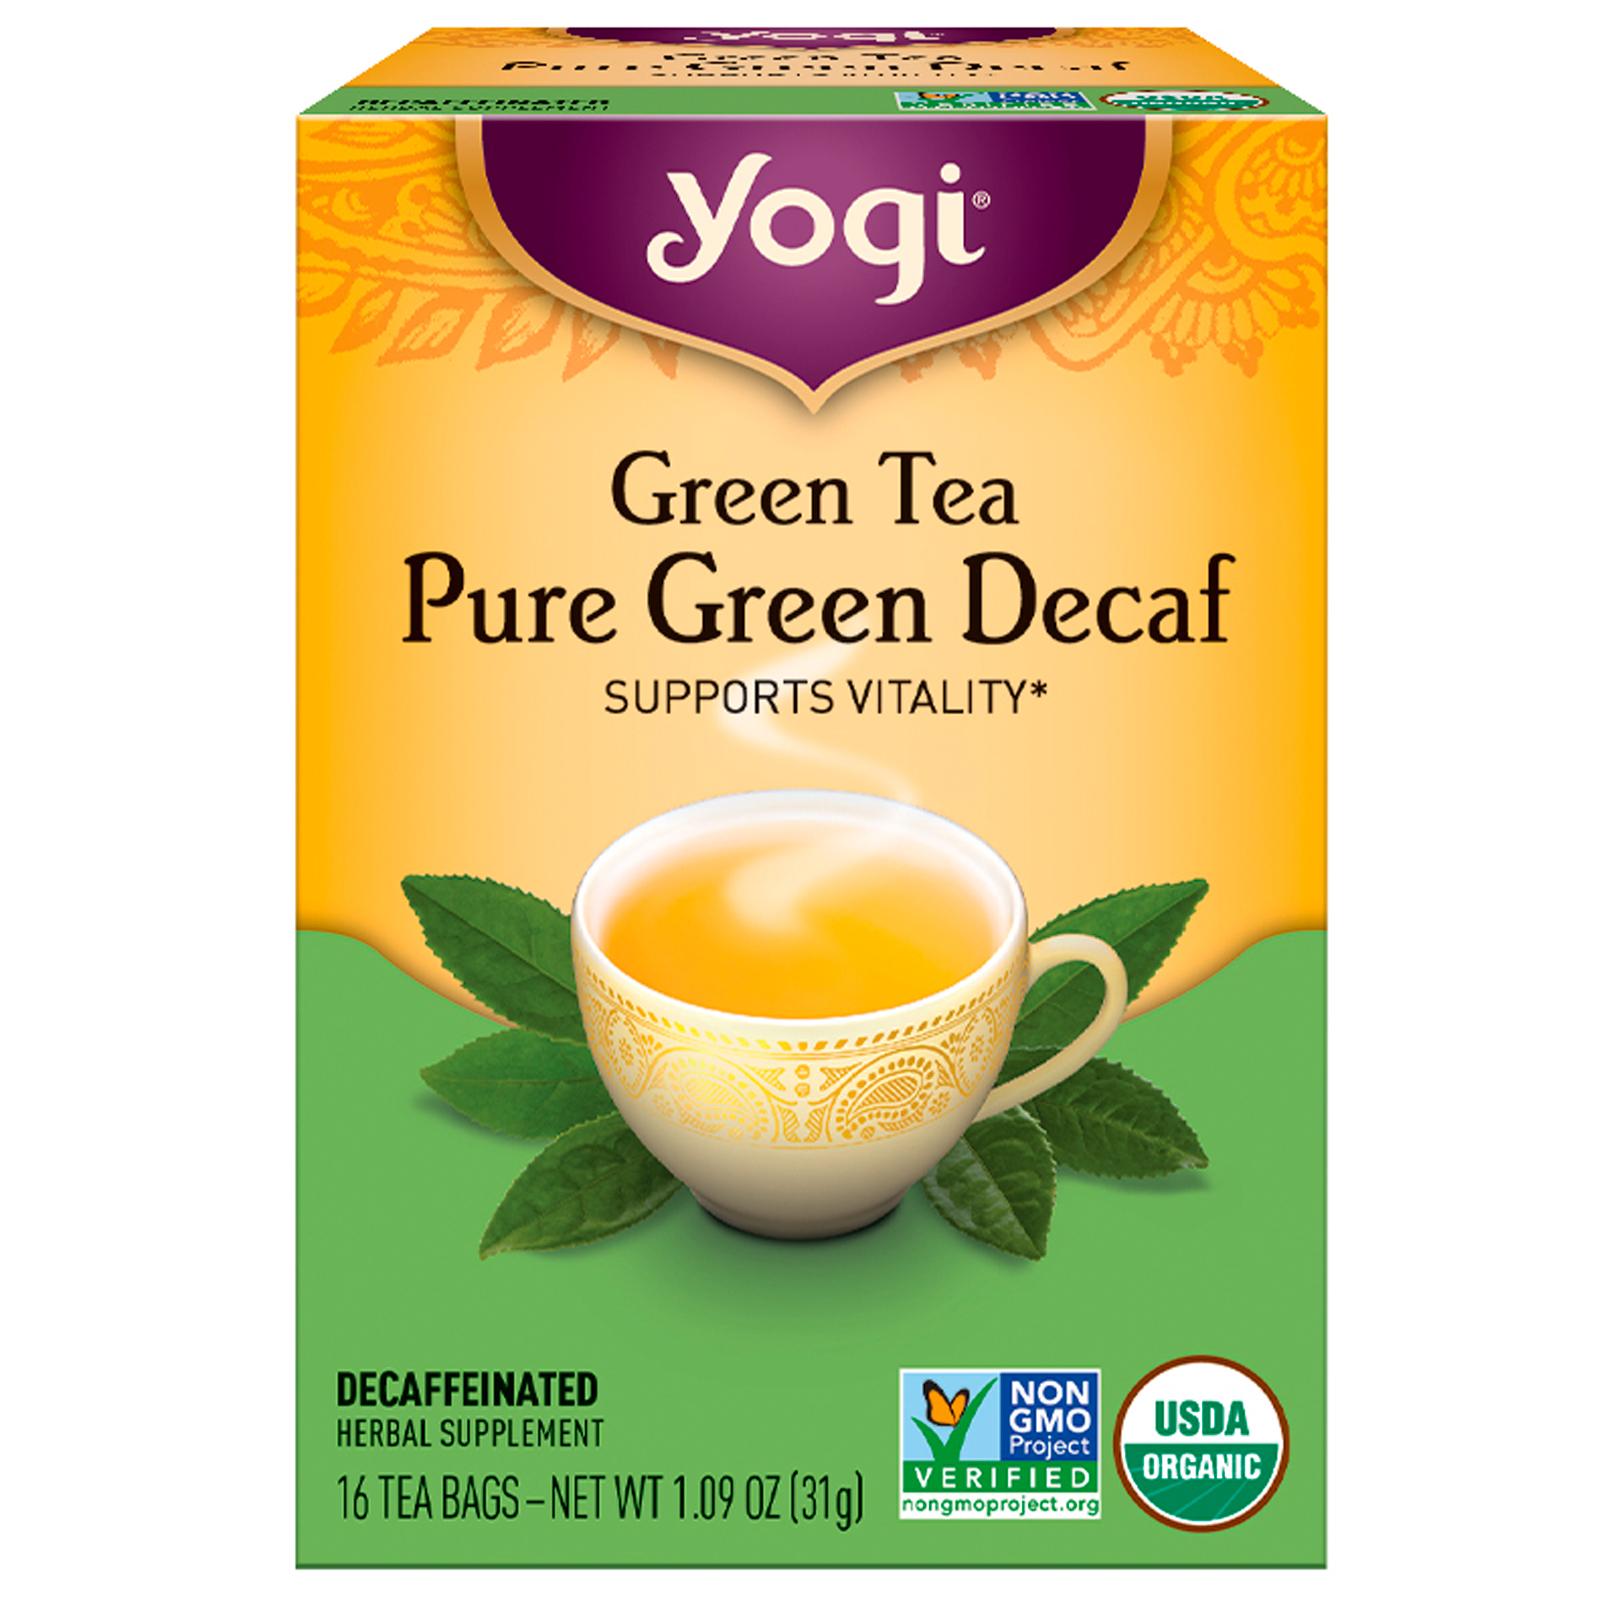 Yogi Tea, Green Tea, Pure Green Decaf